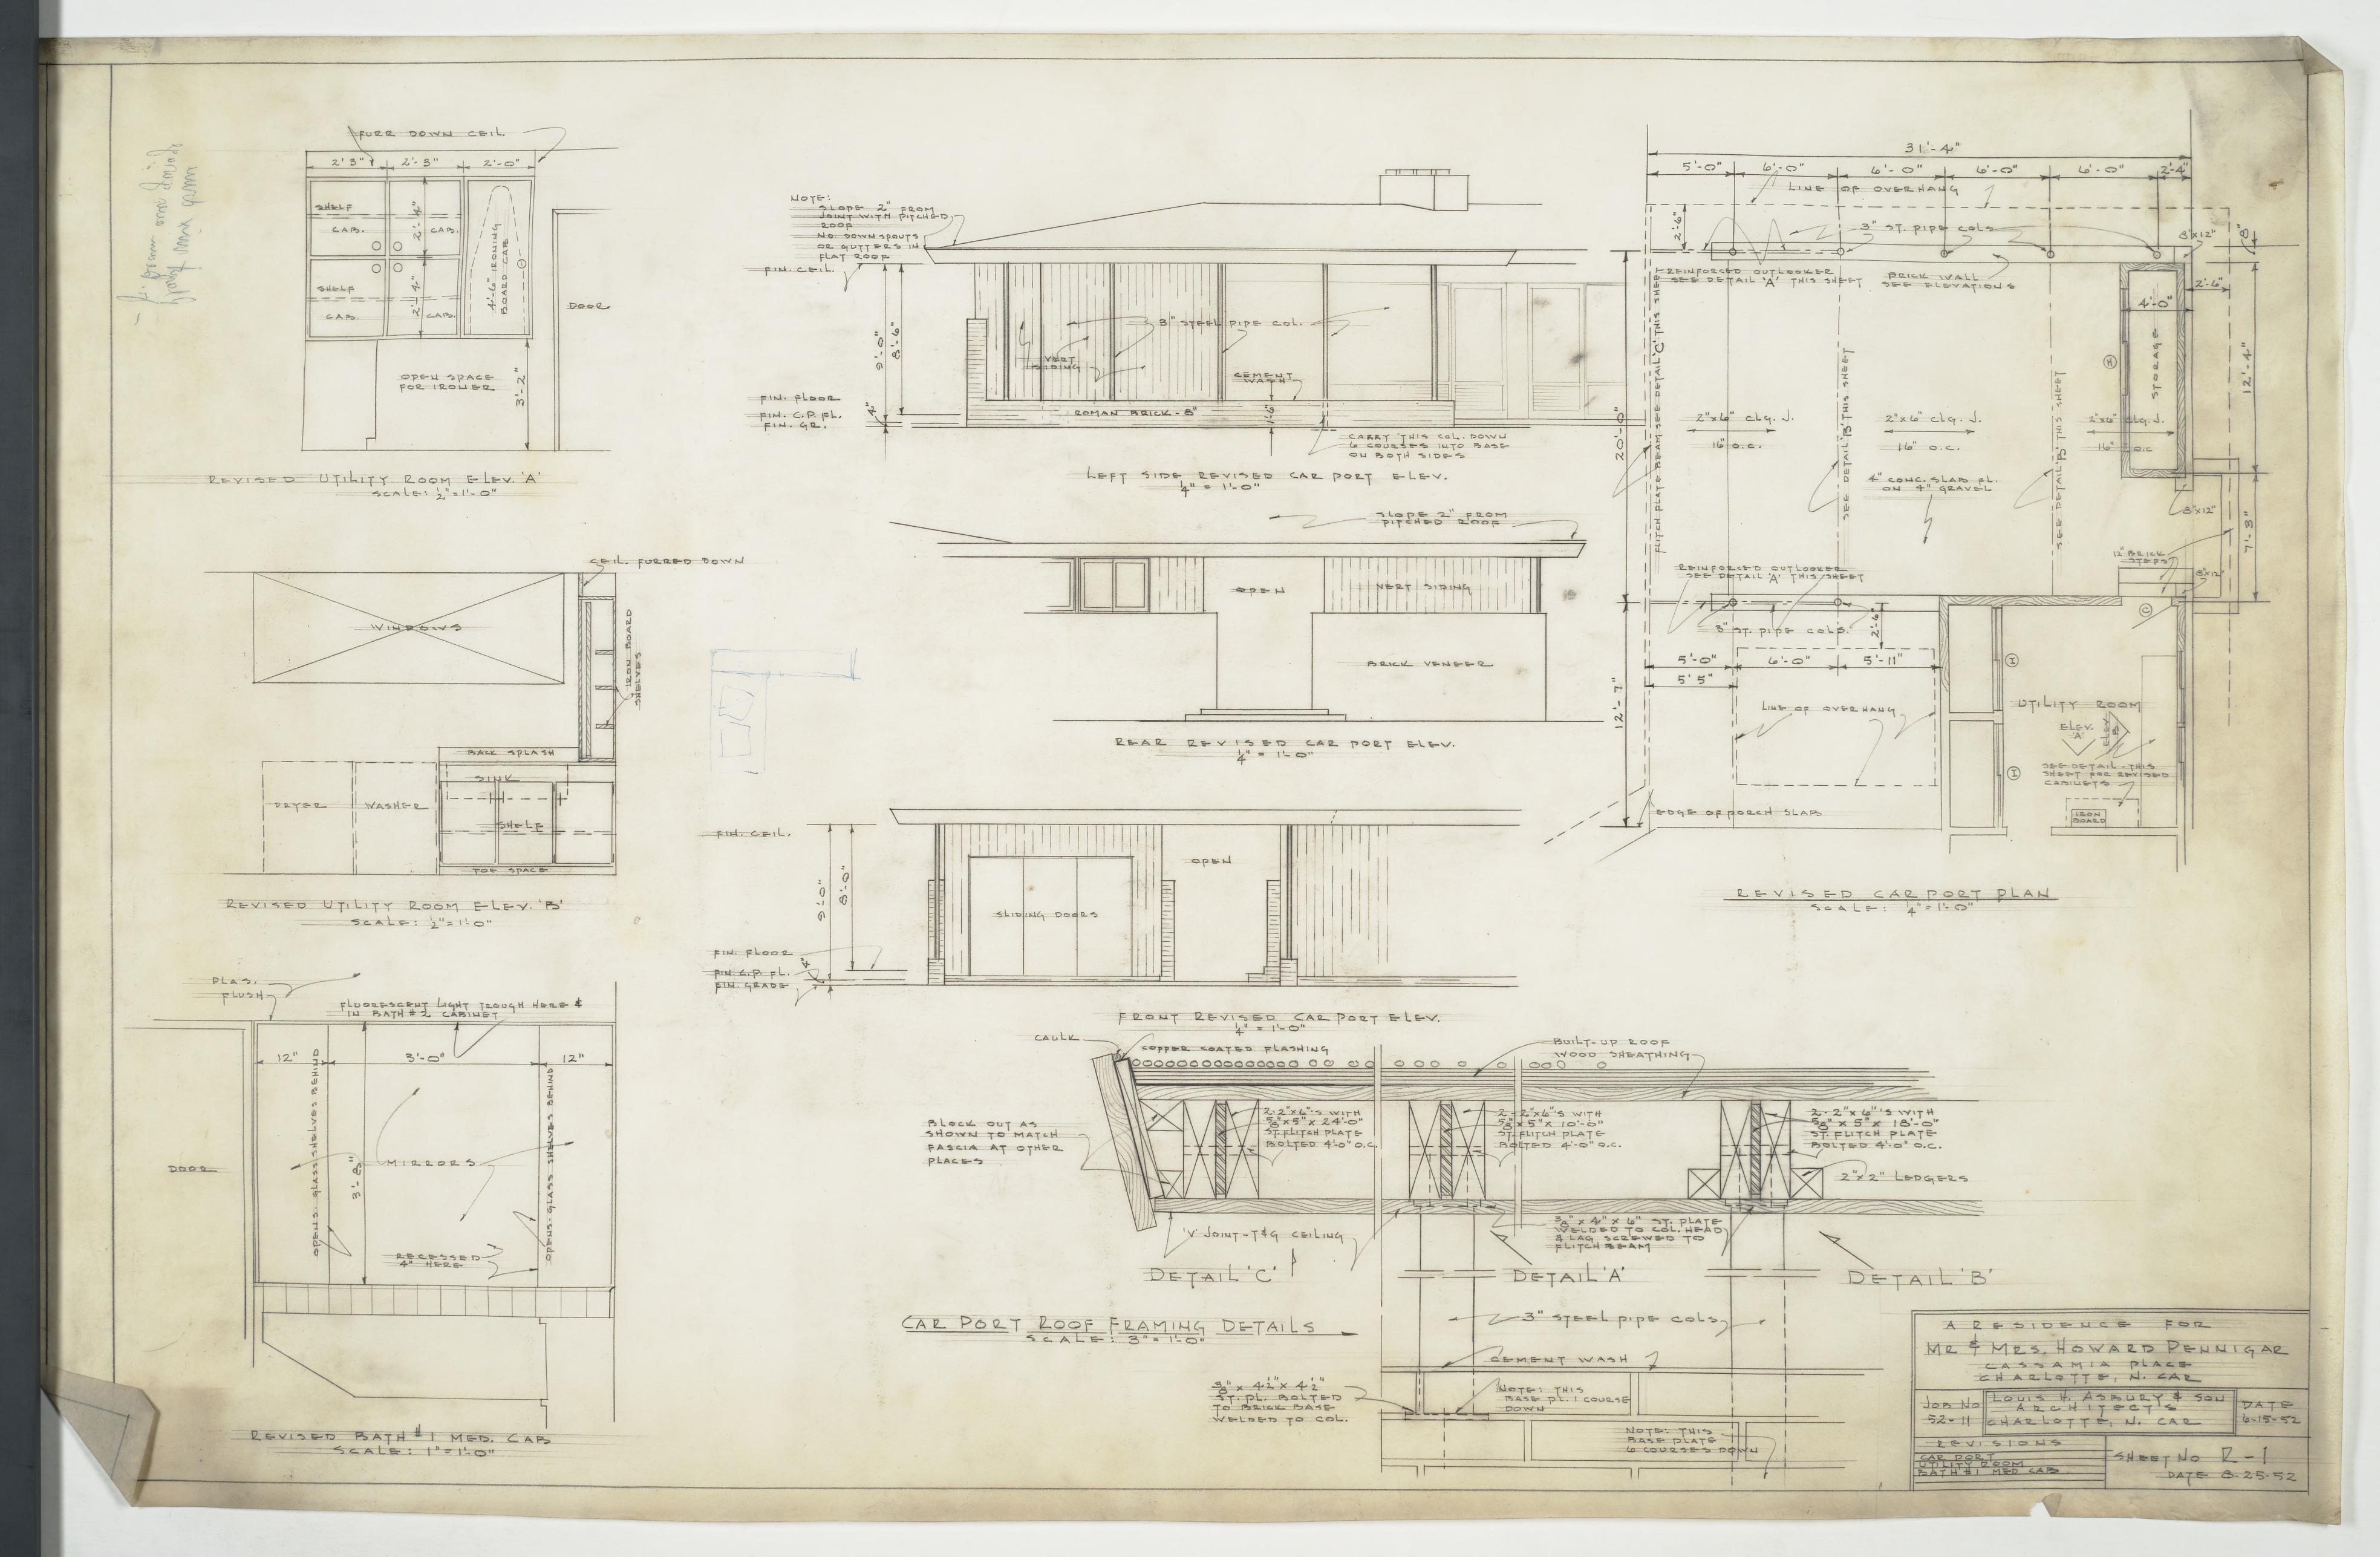 Bathroom and carport floor plans elevations and sections for Floor plans elevations and sections